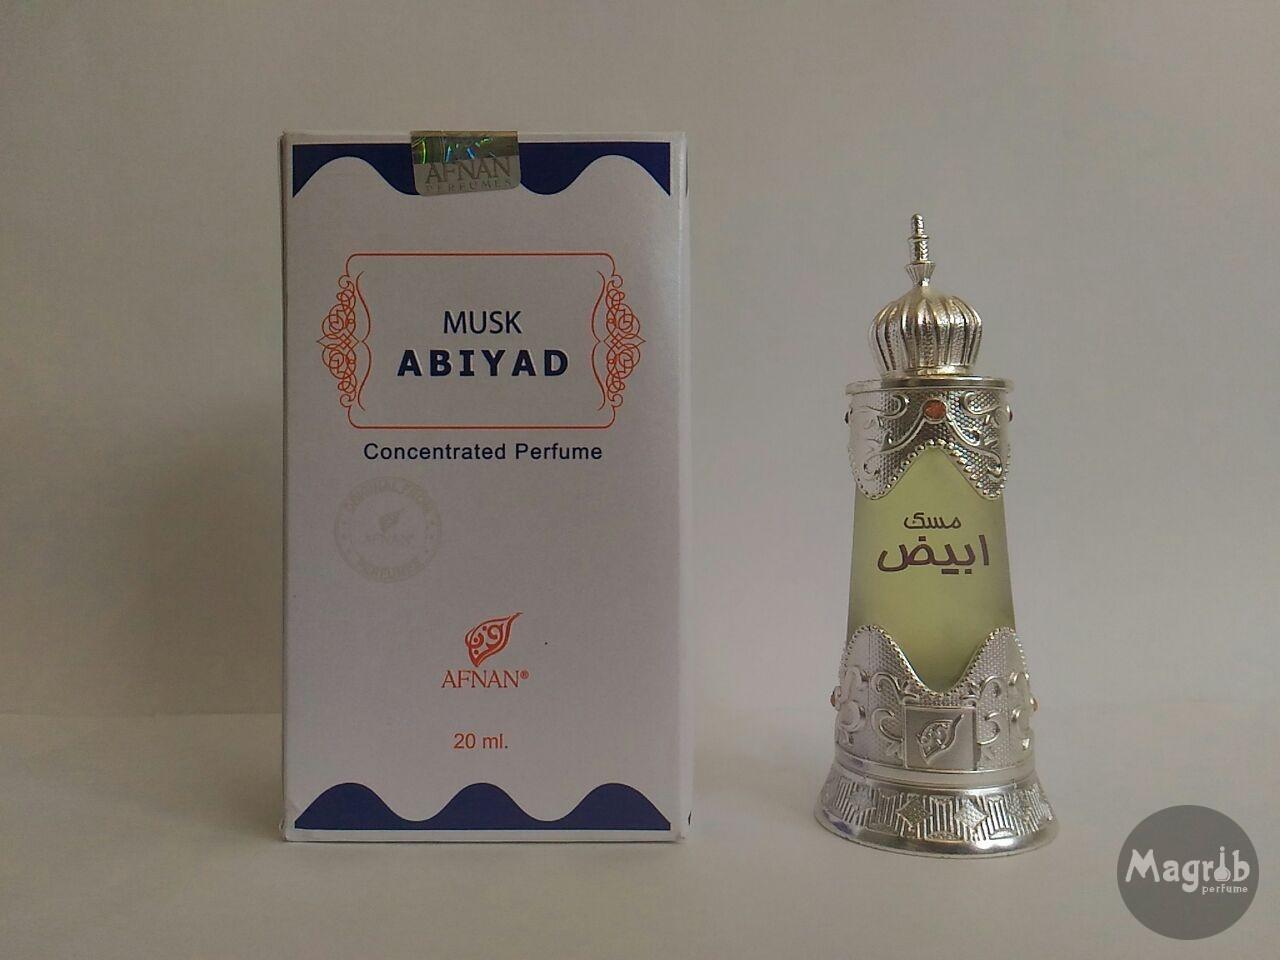 Afnan Musk Abiyad 20ml- масляные духи.